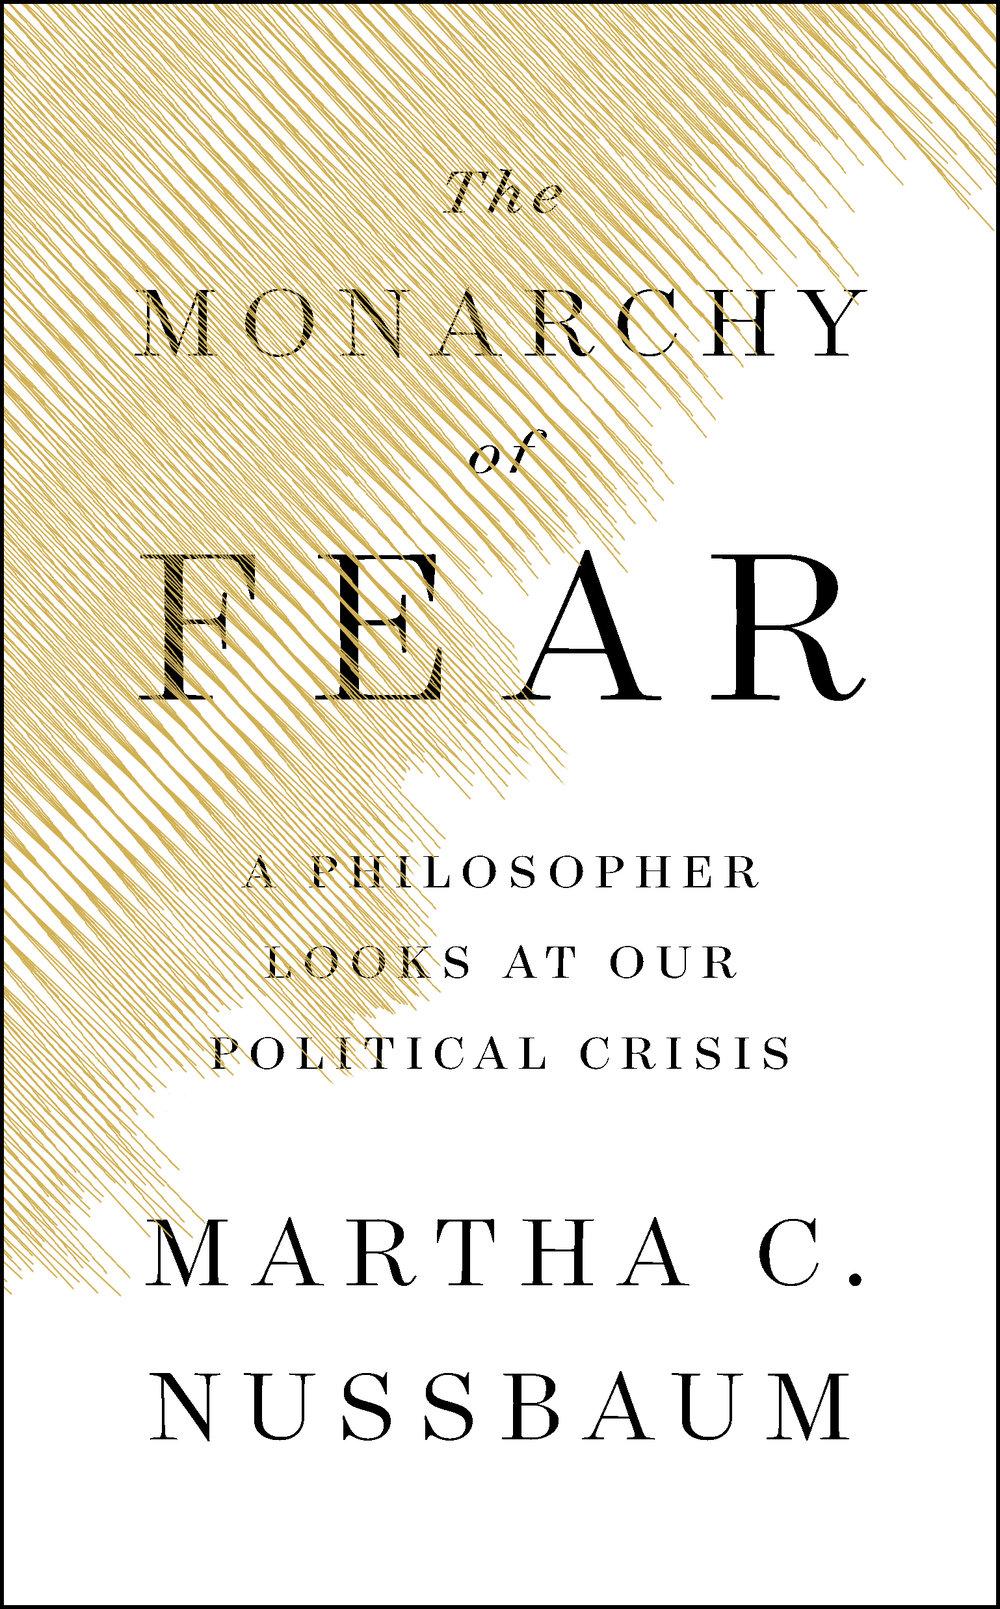 Cover image courtesy of Simon & Schuster.